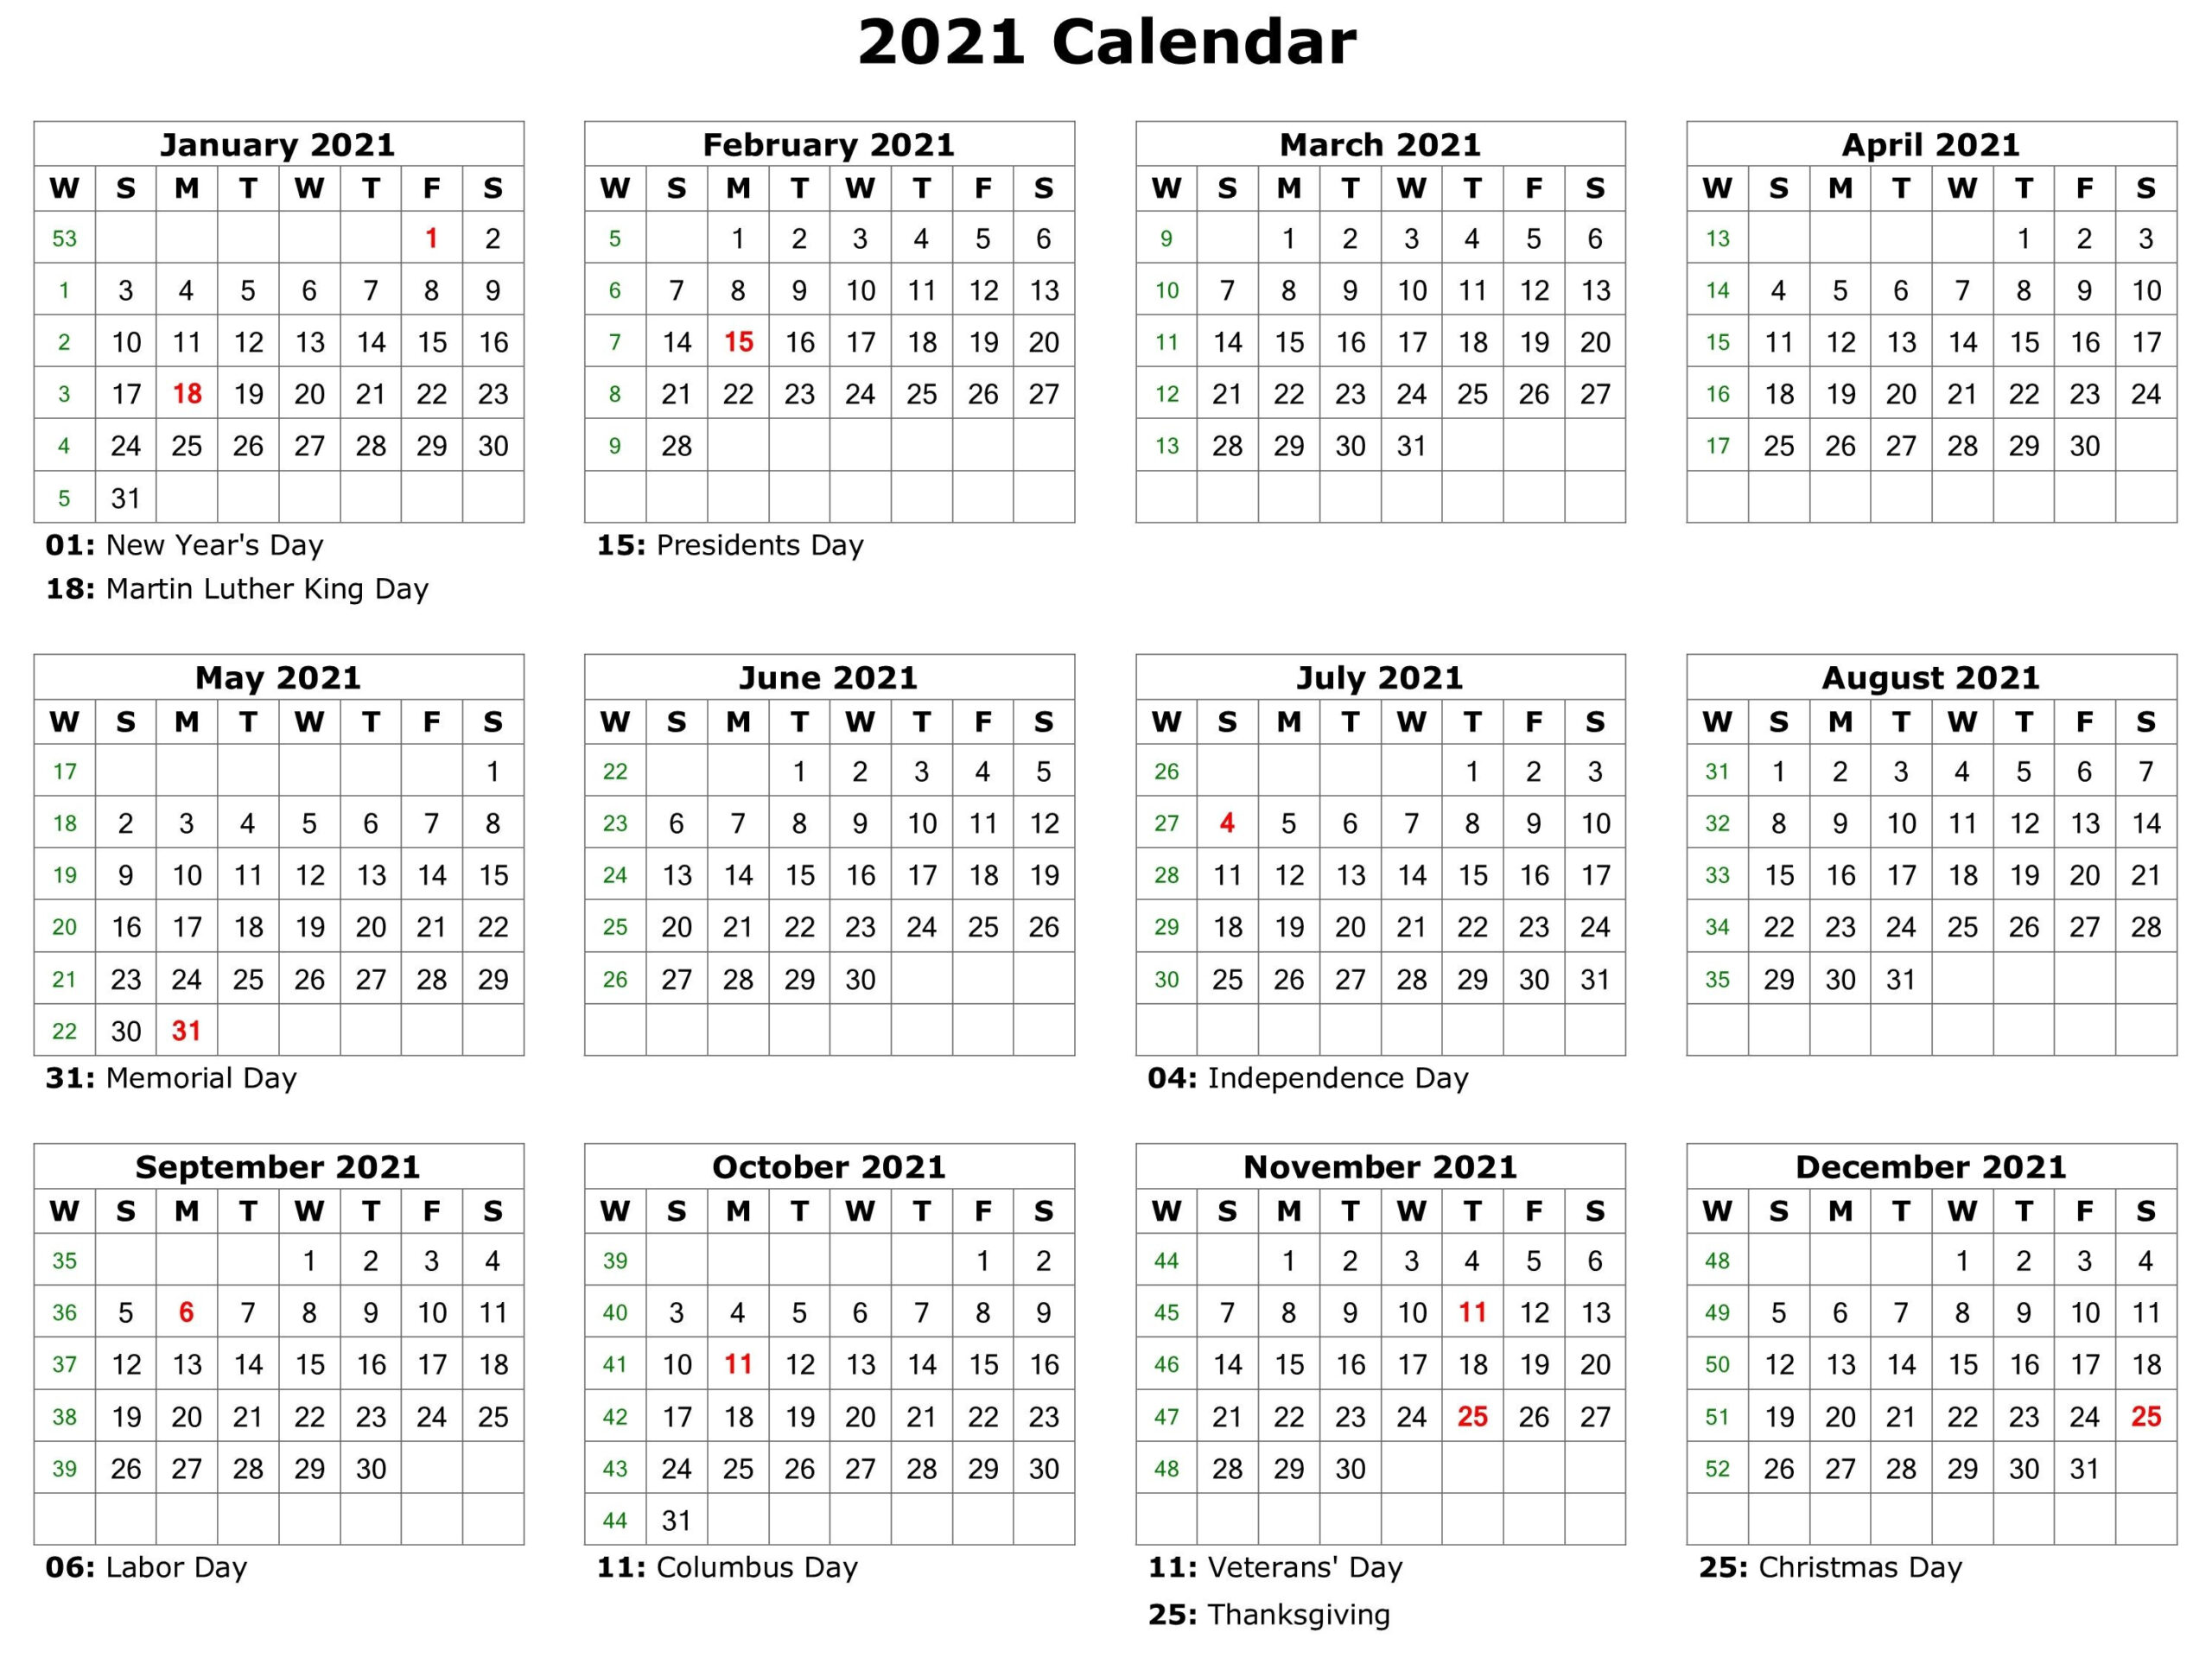 20+ 2021 Holidays - Free Download Printable Calendar-Philippine 2021 Calendar.pdf